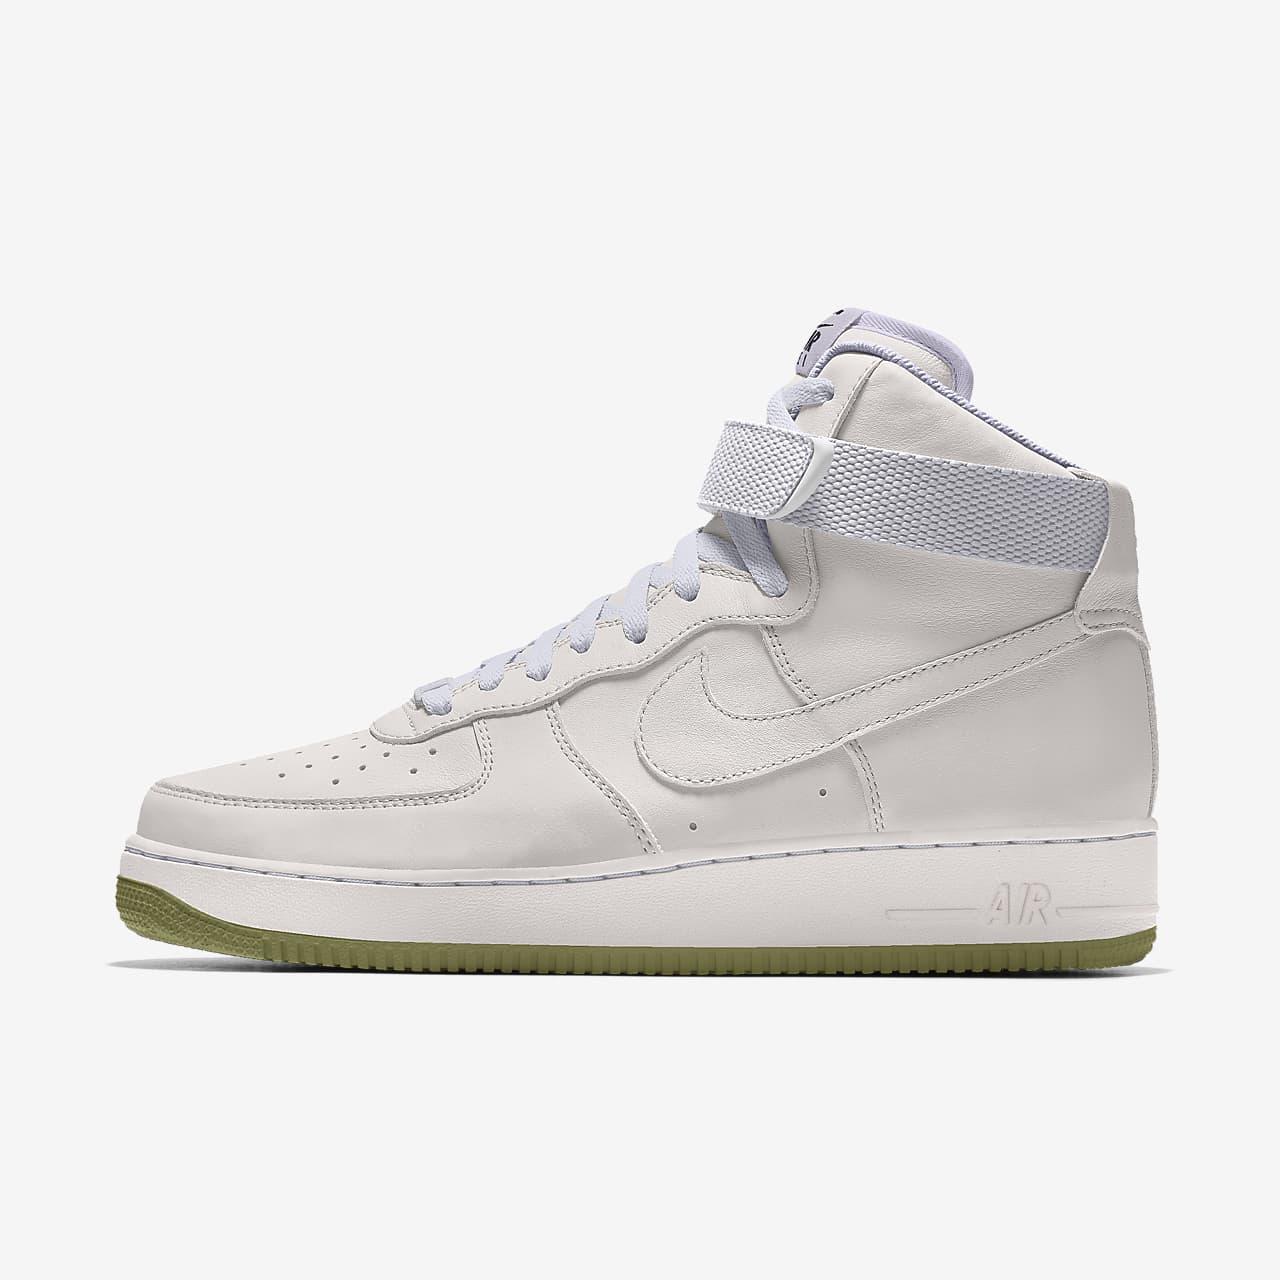 Nike Air Force 1 High By You egyedi női cipő